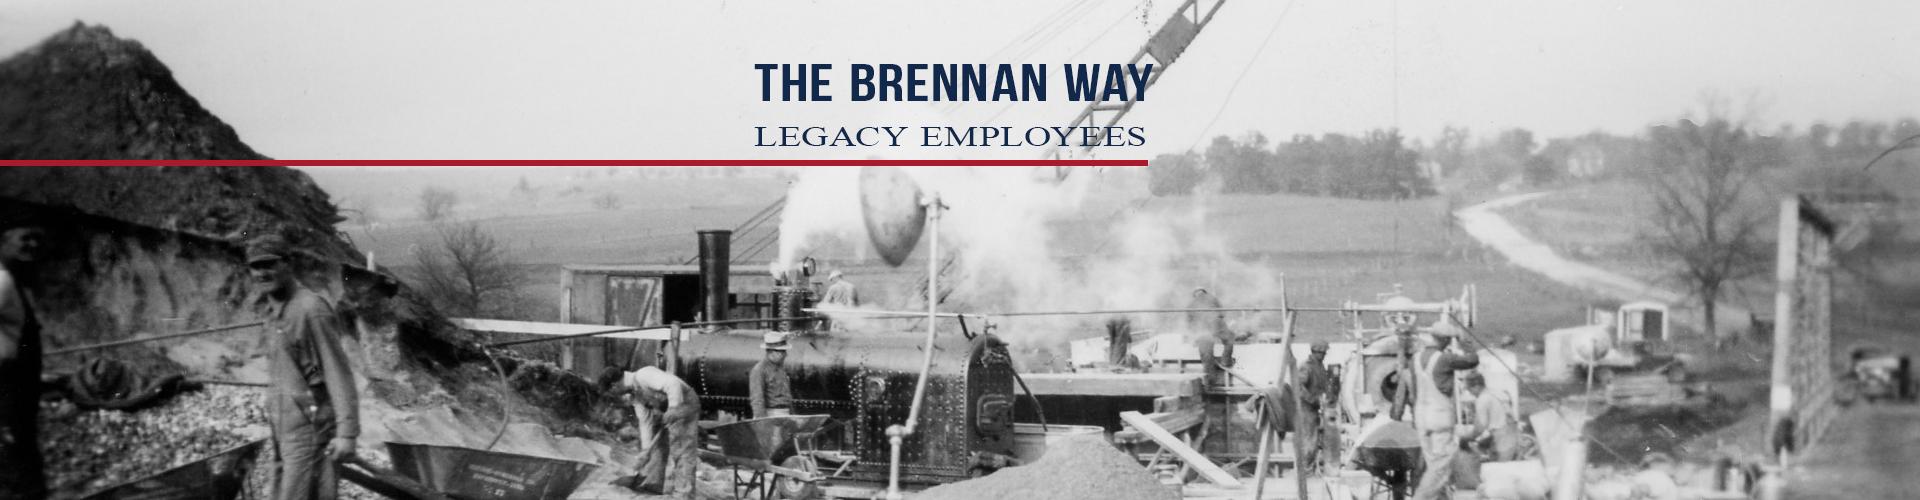 Legacy Employees Banner header